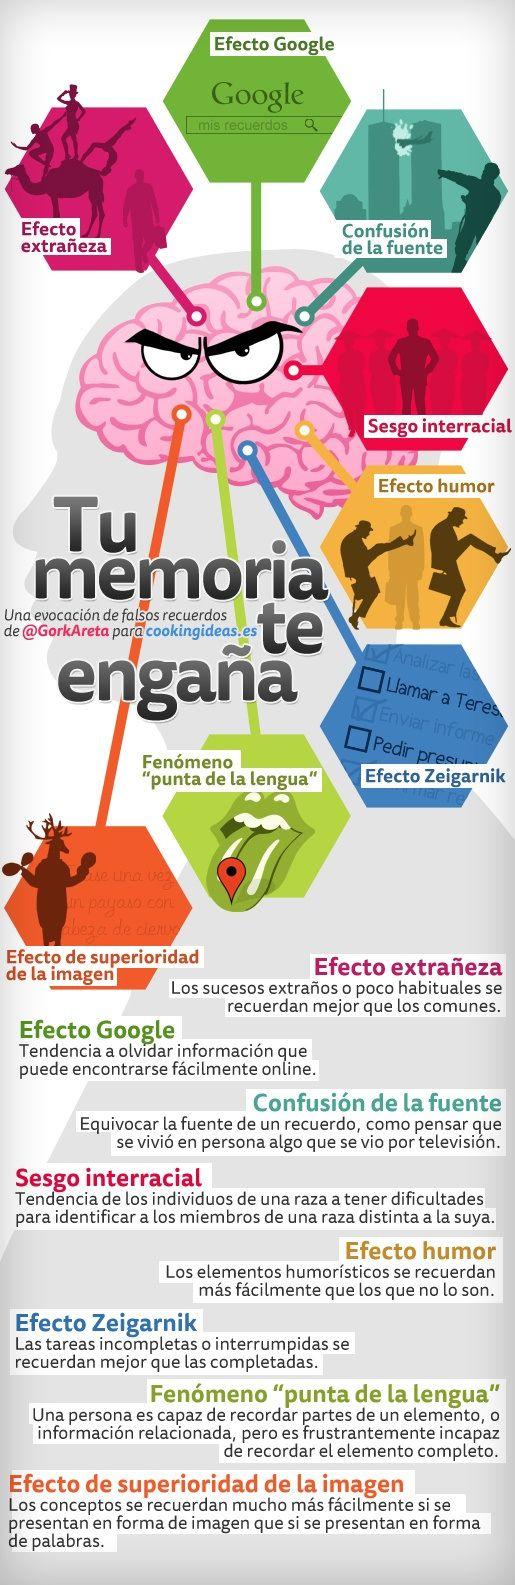 Tu memoria te engaña #Infografia #Education                                                                                                                                                      Más